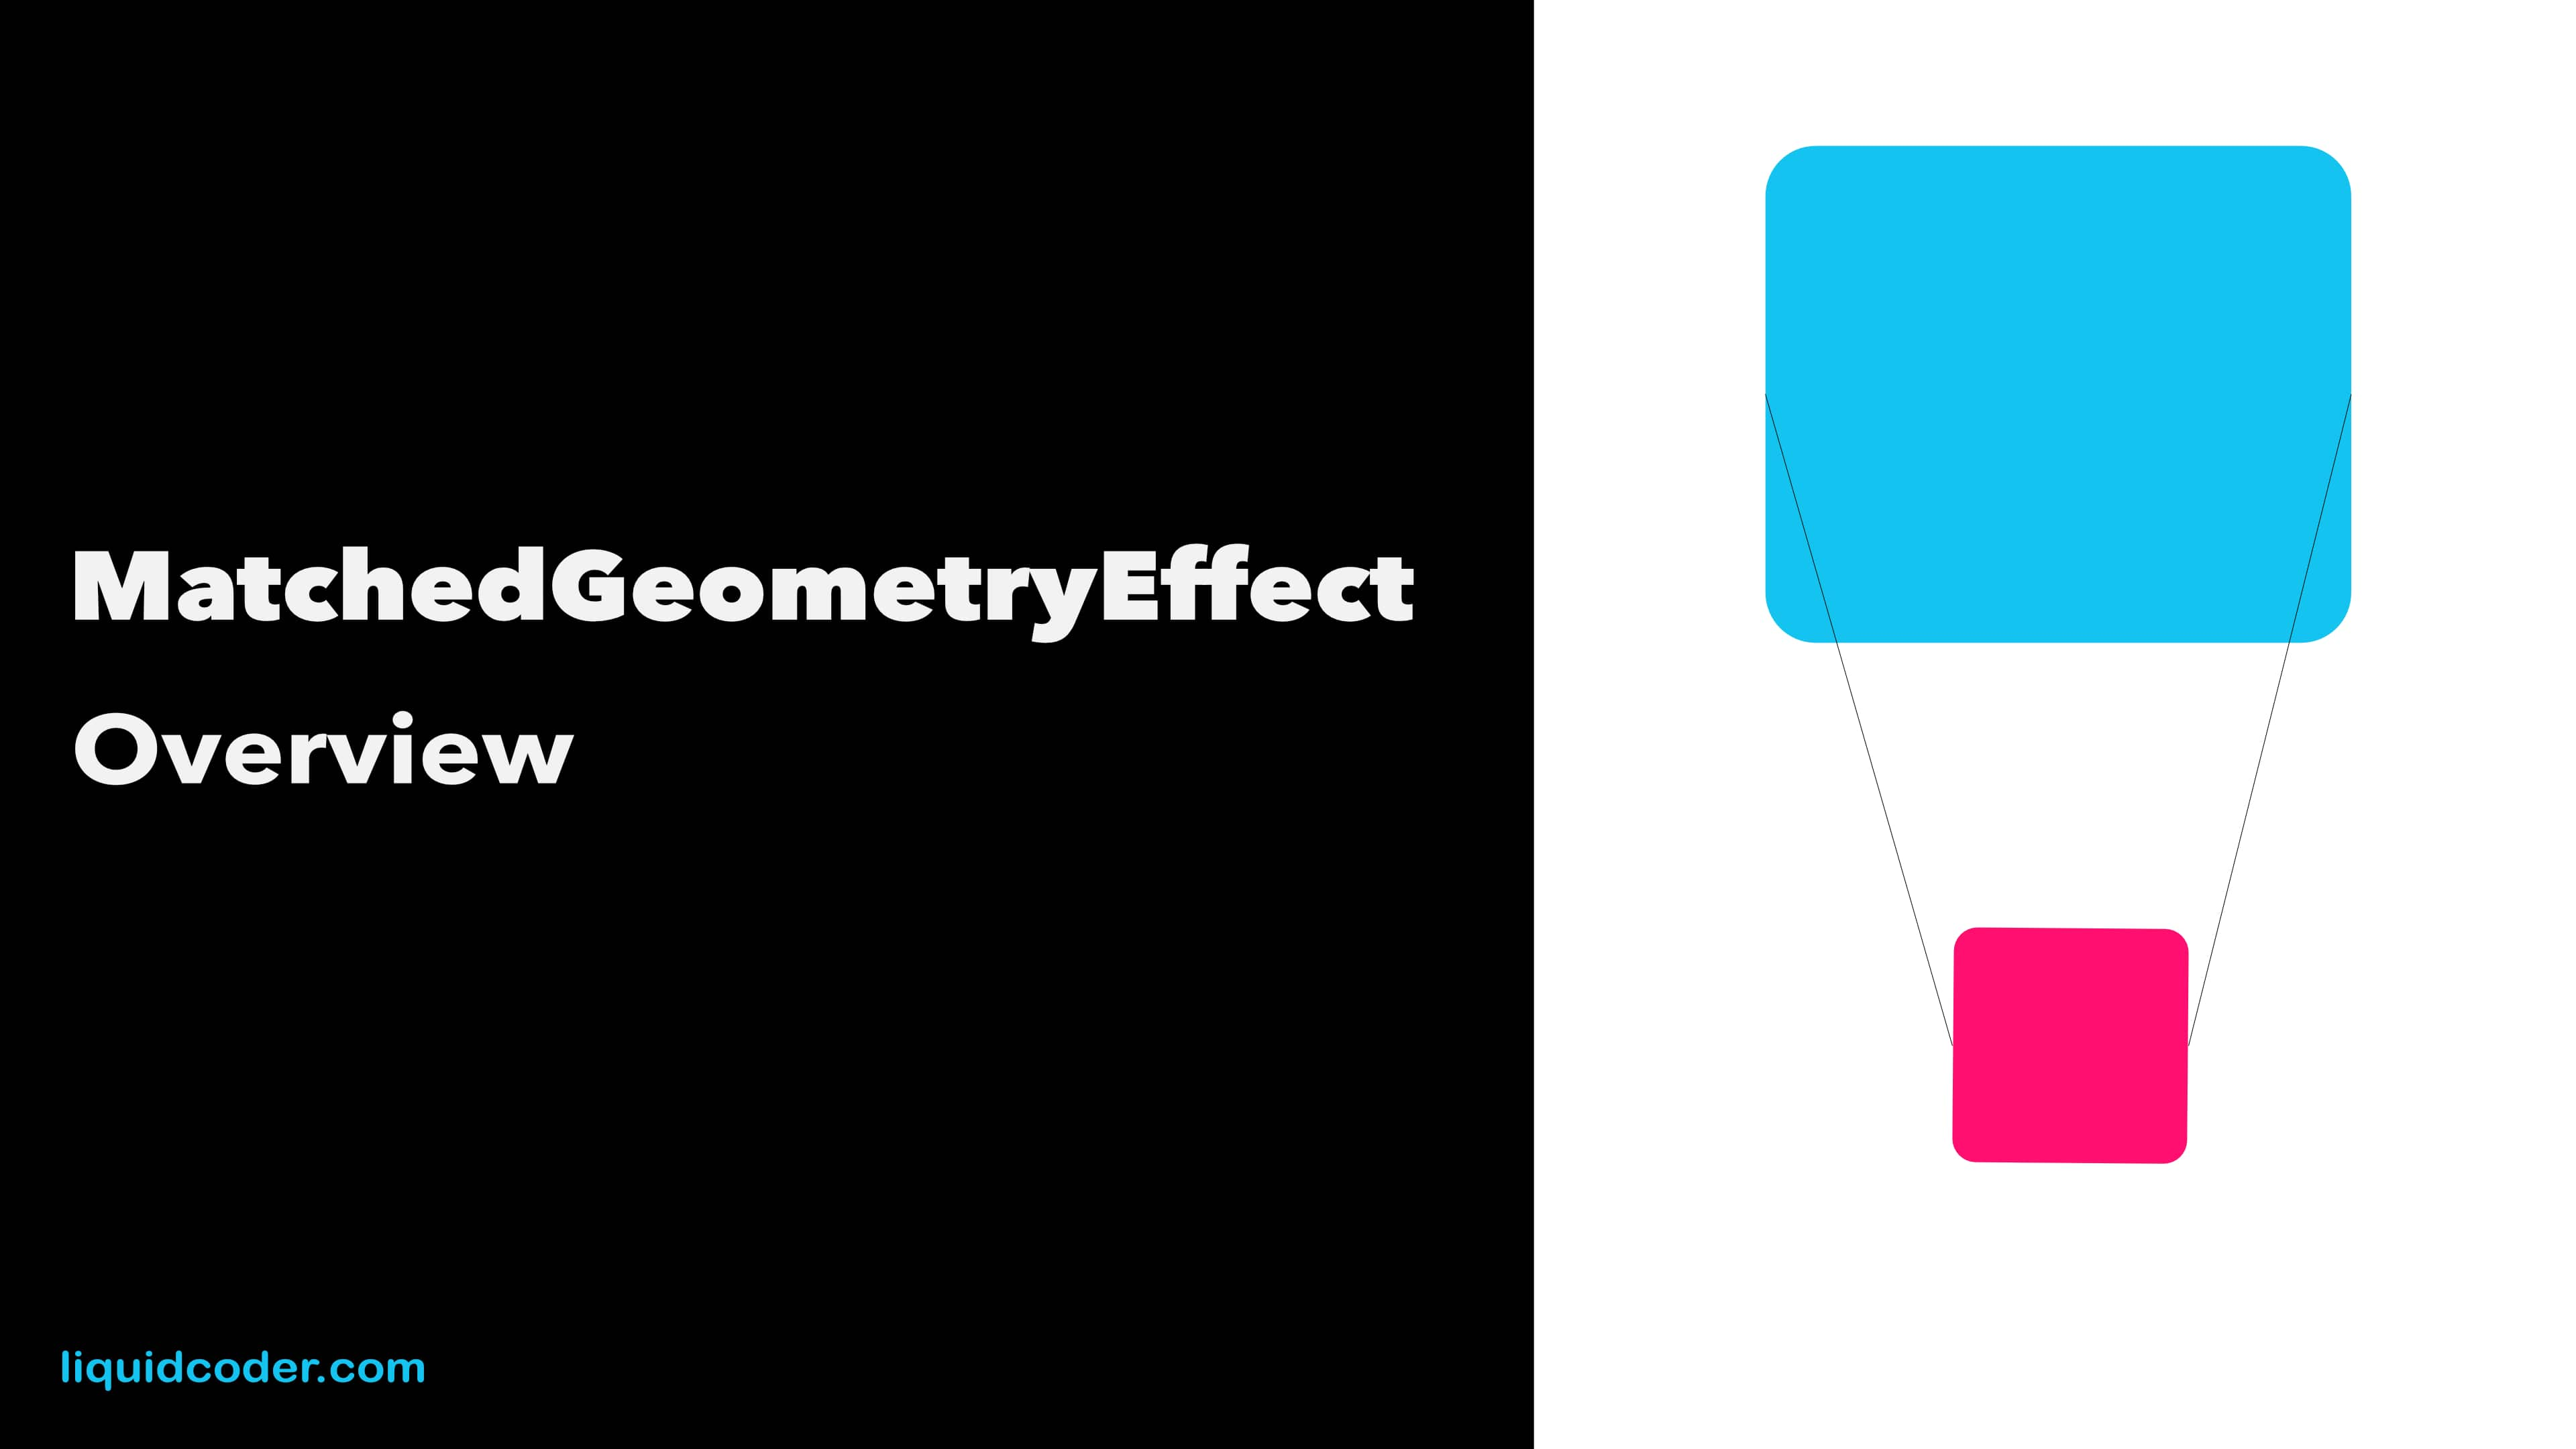 MatchedGeometryEffect Overview